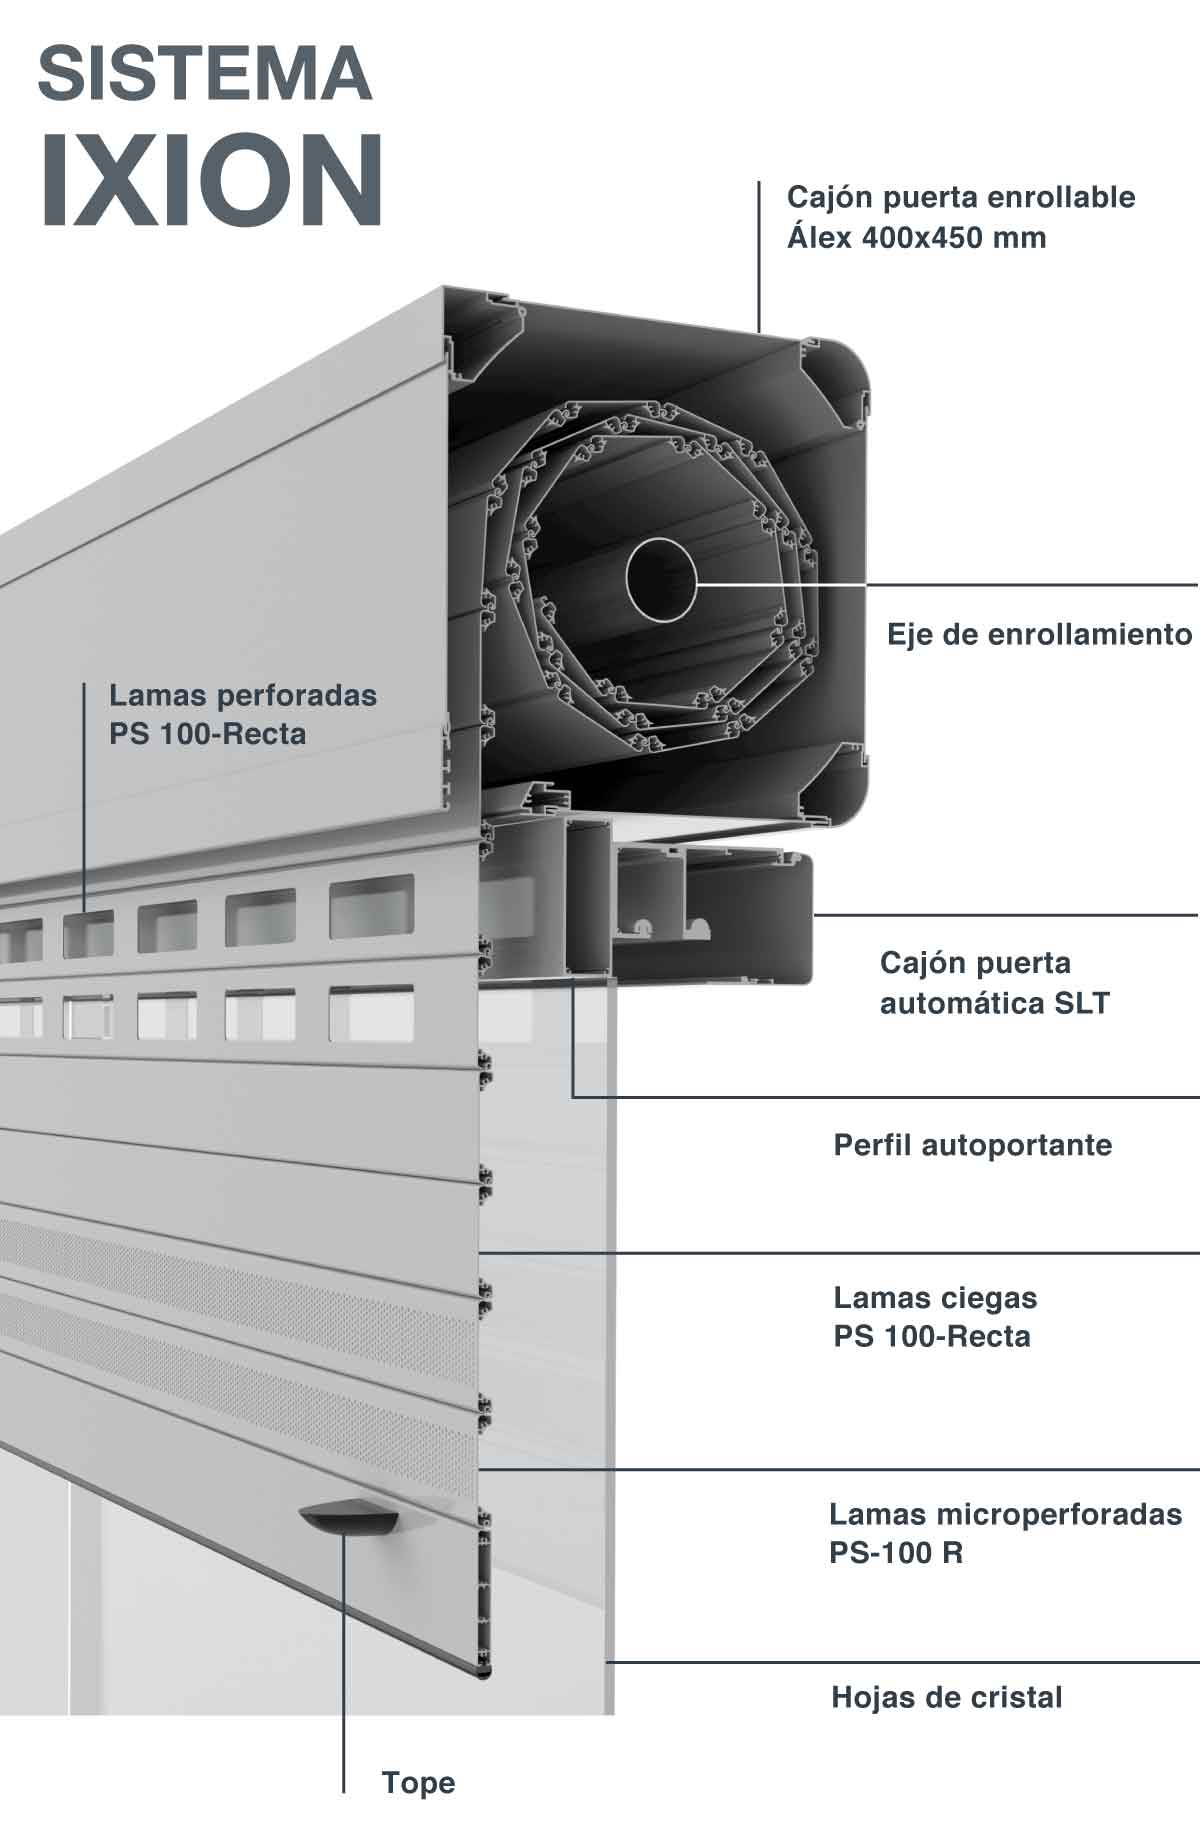 Giménez Ganga lanza el sistema de puertas automáticas 'Ixion'